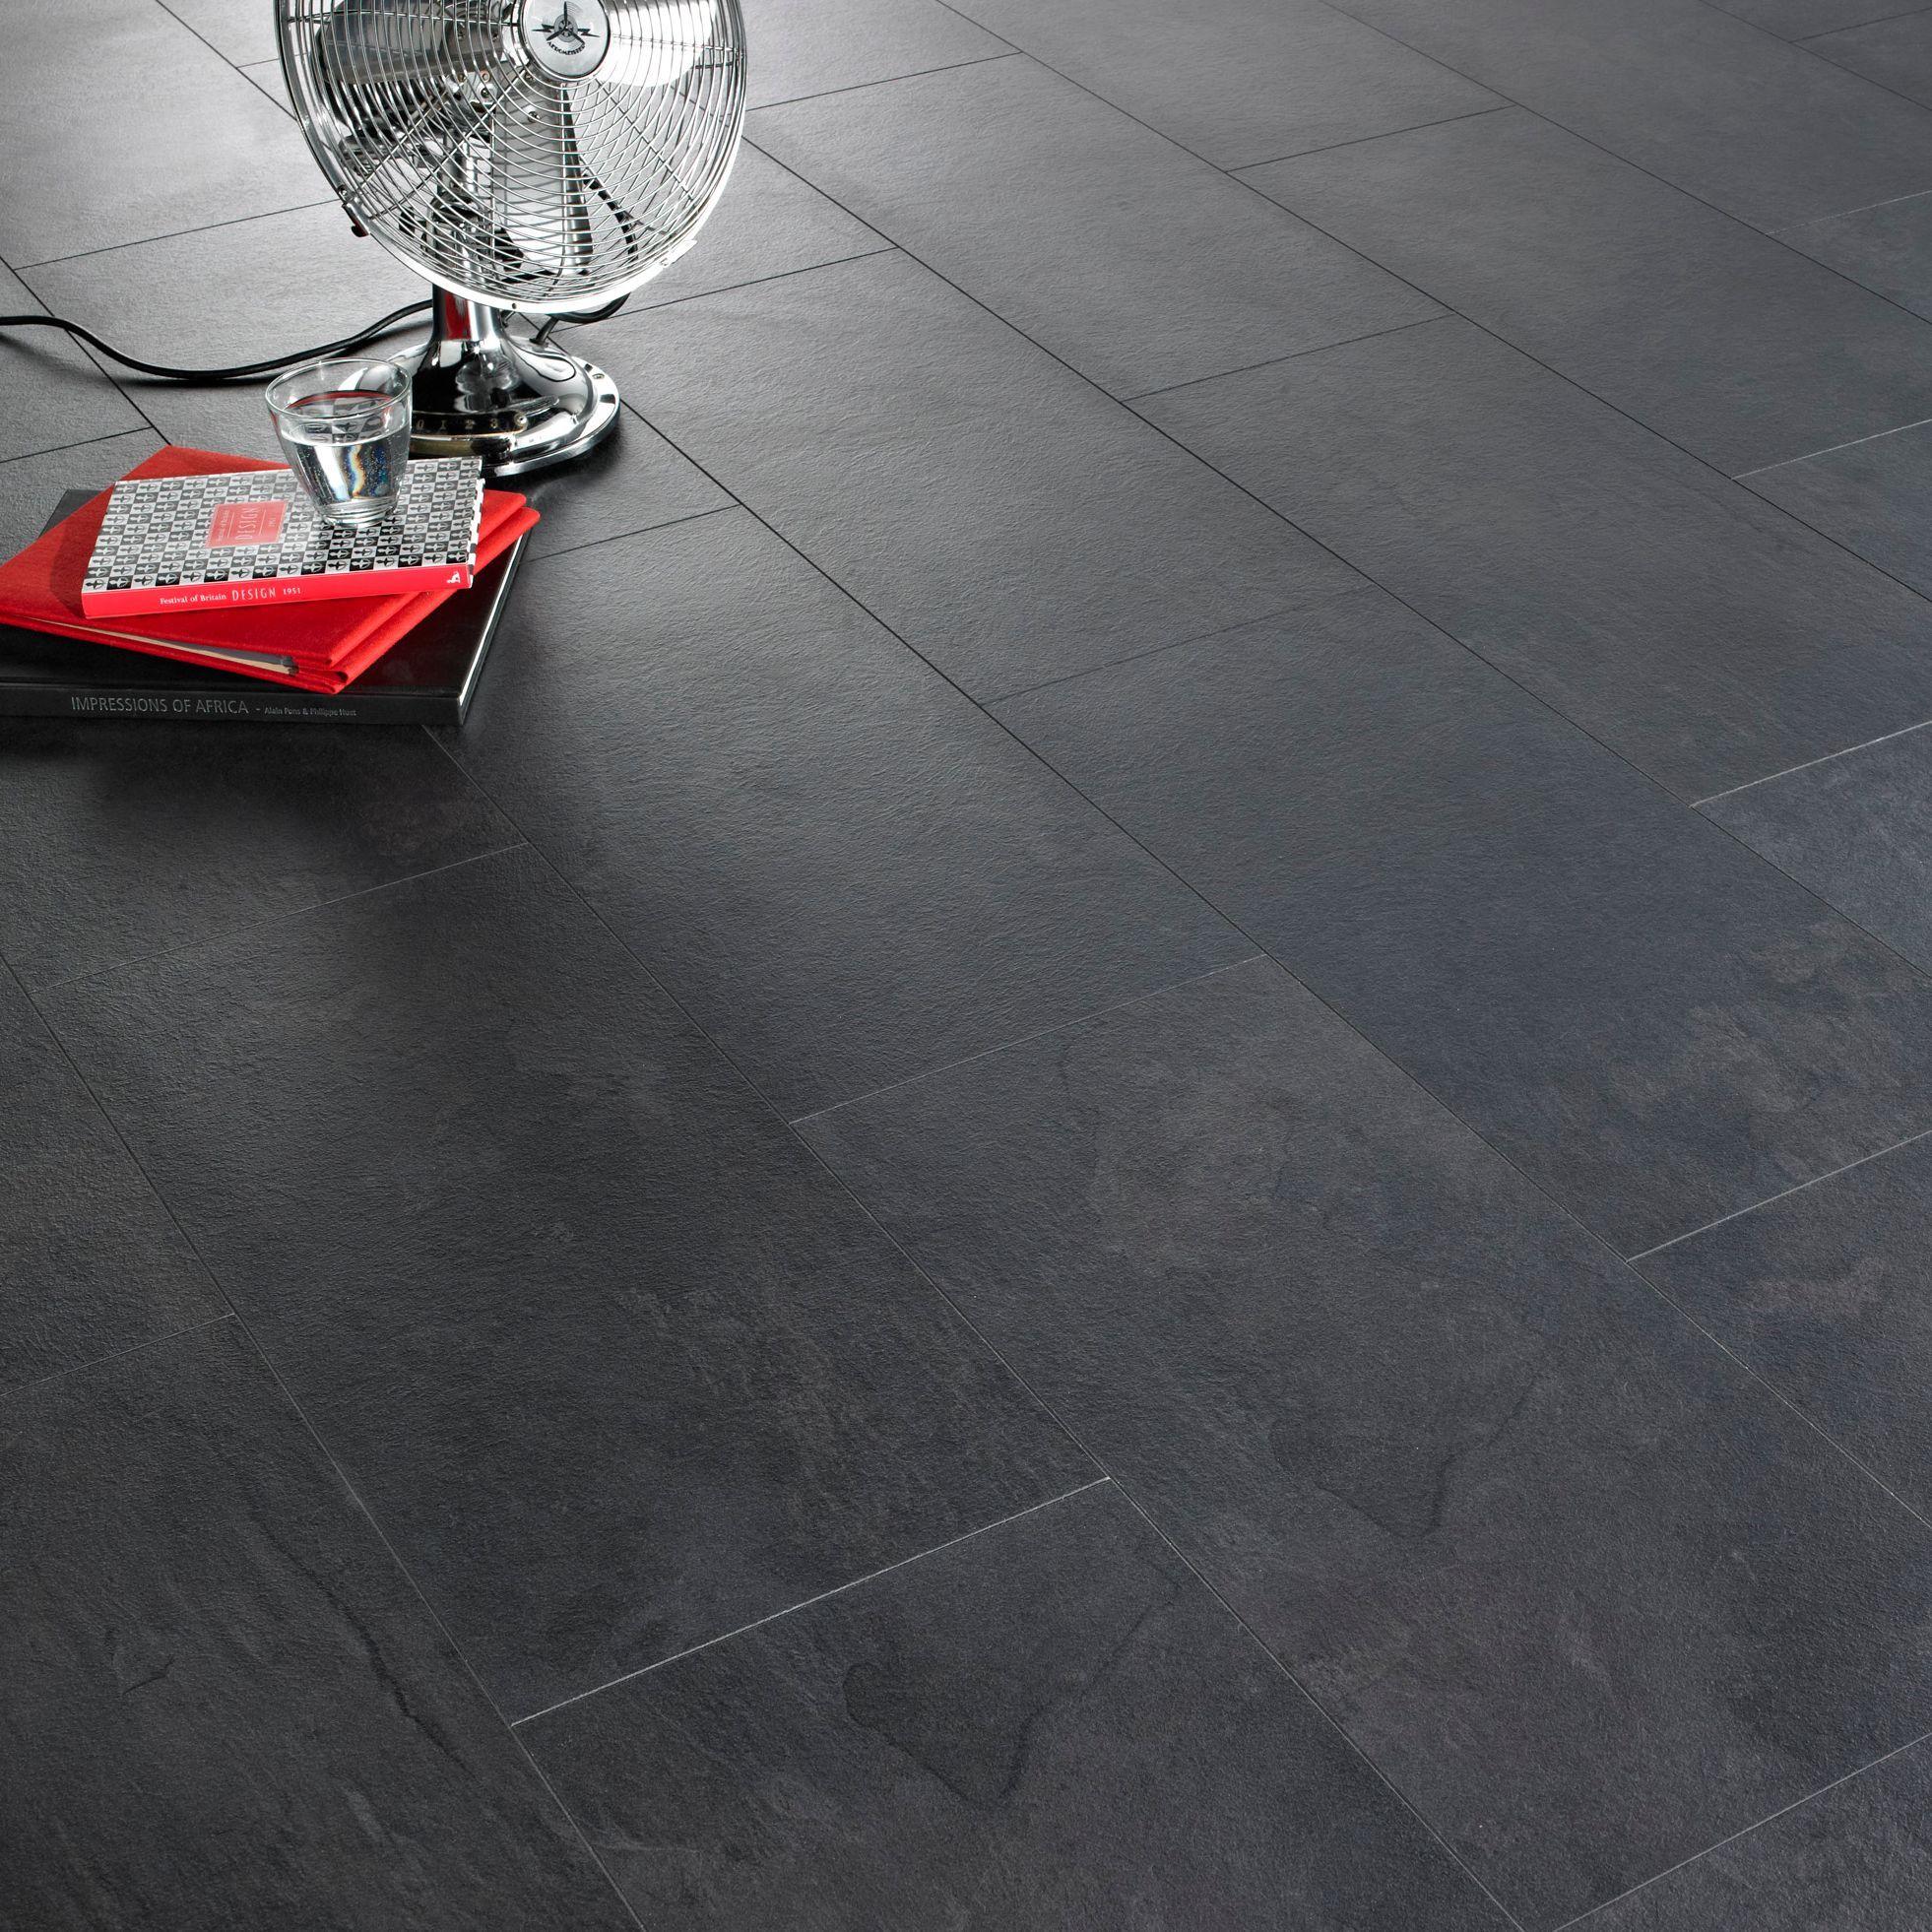 Bq Kitchen Laminate Flooring Harmonia Black Slate Effect Laminate Flooring 205 Ma2 Pack Diy